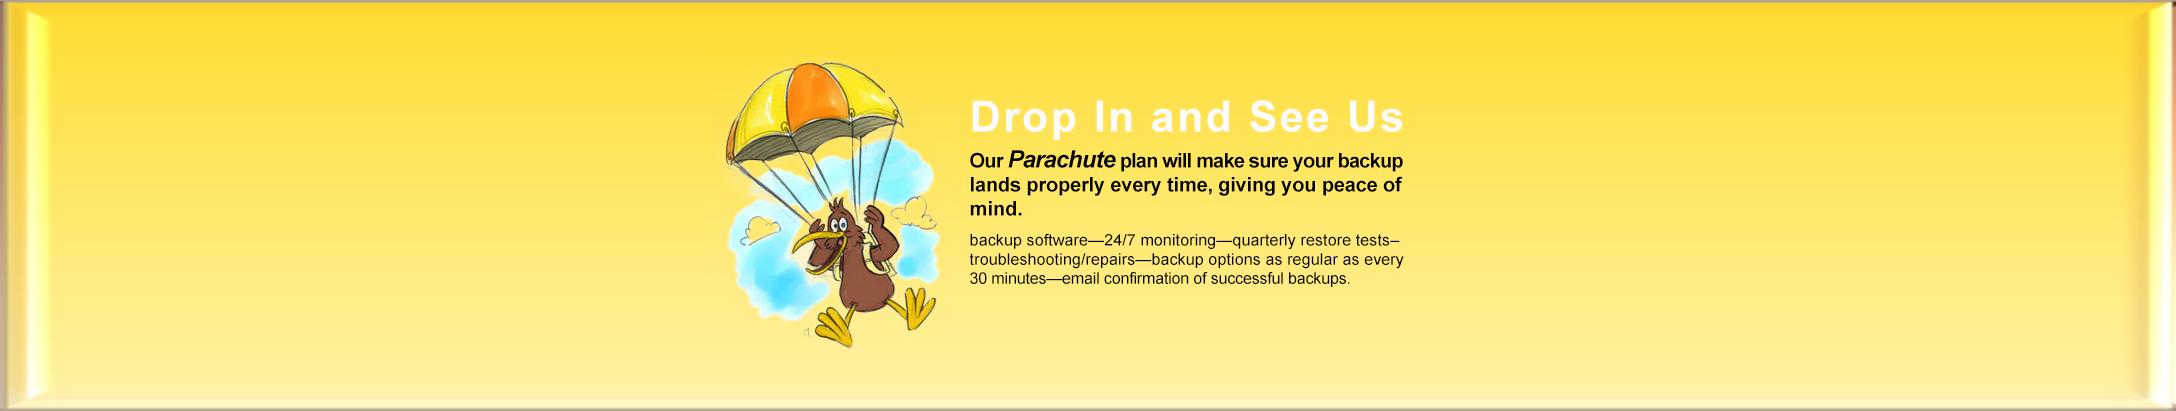 Parachute Plan